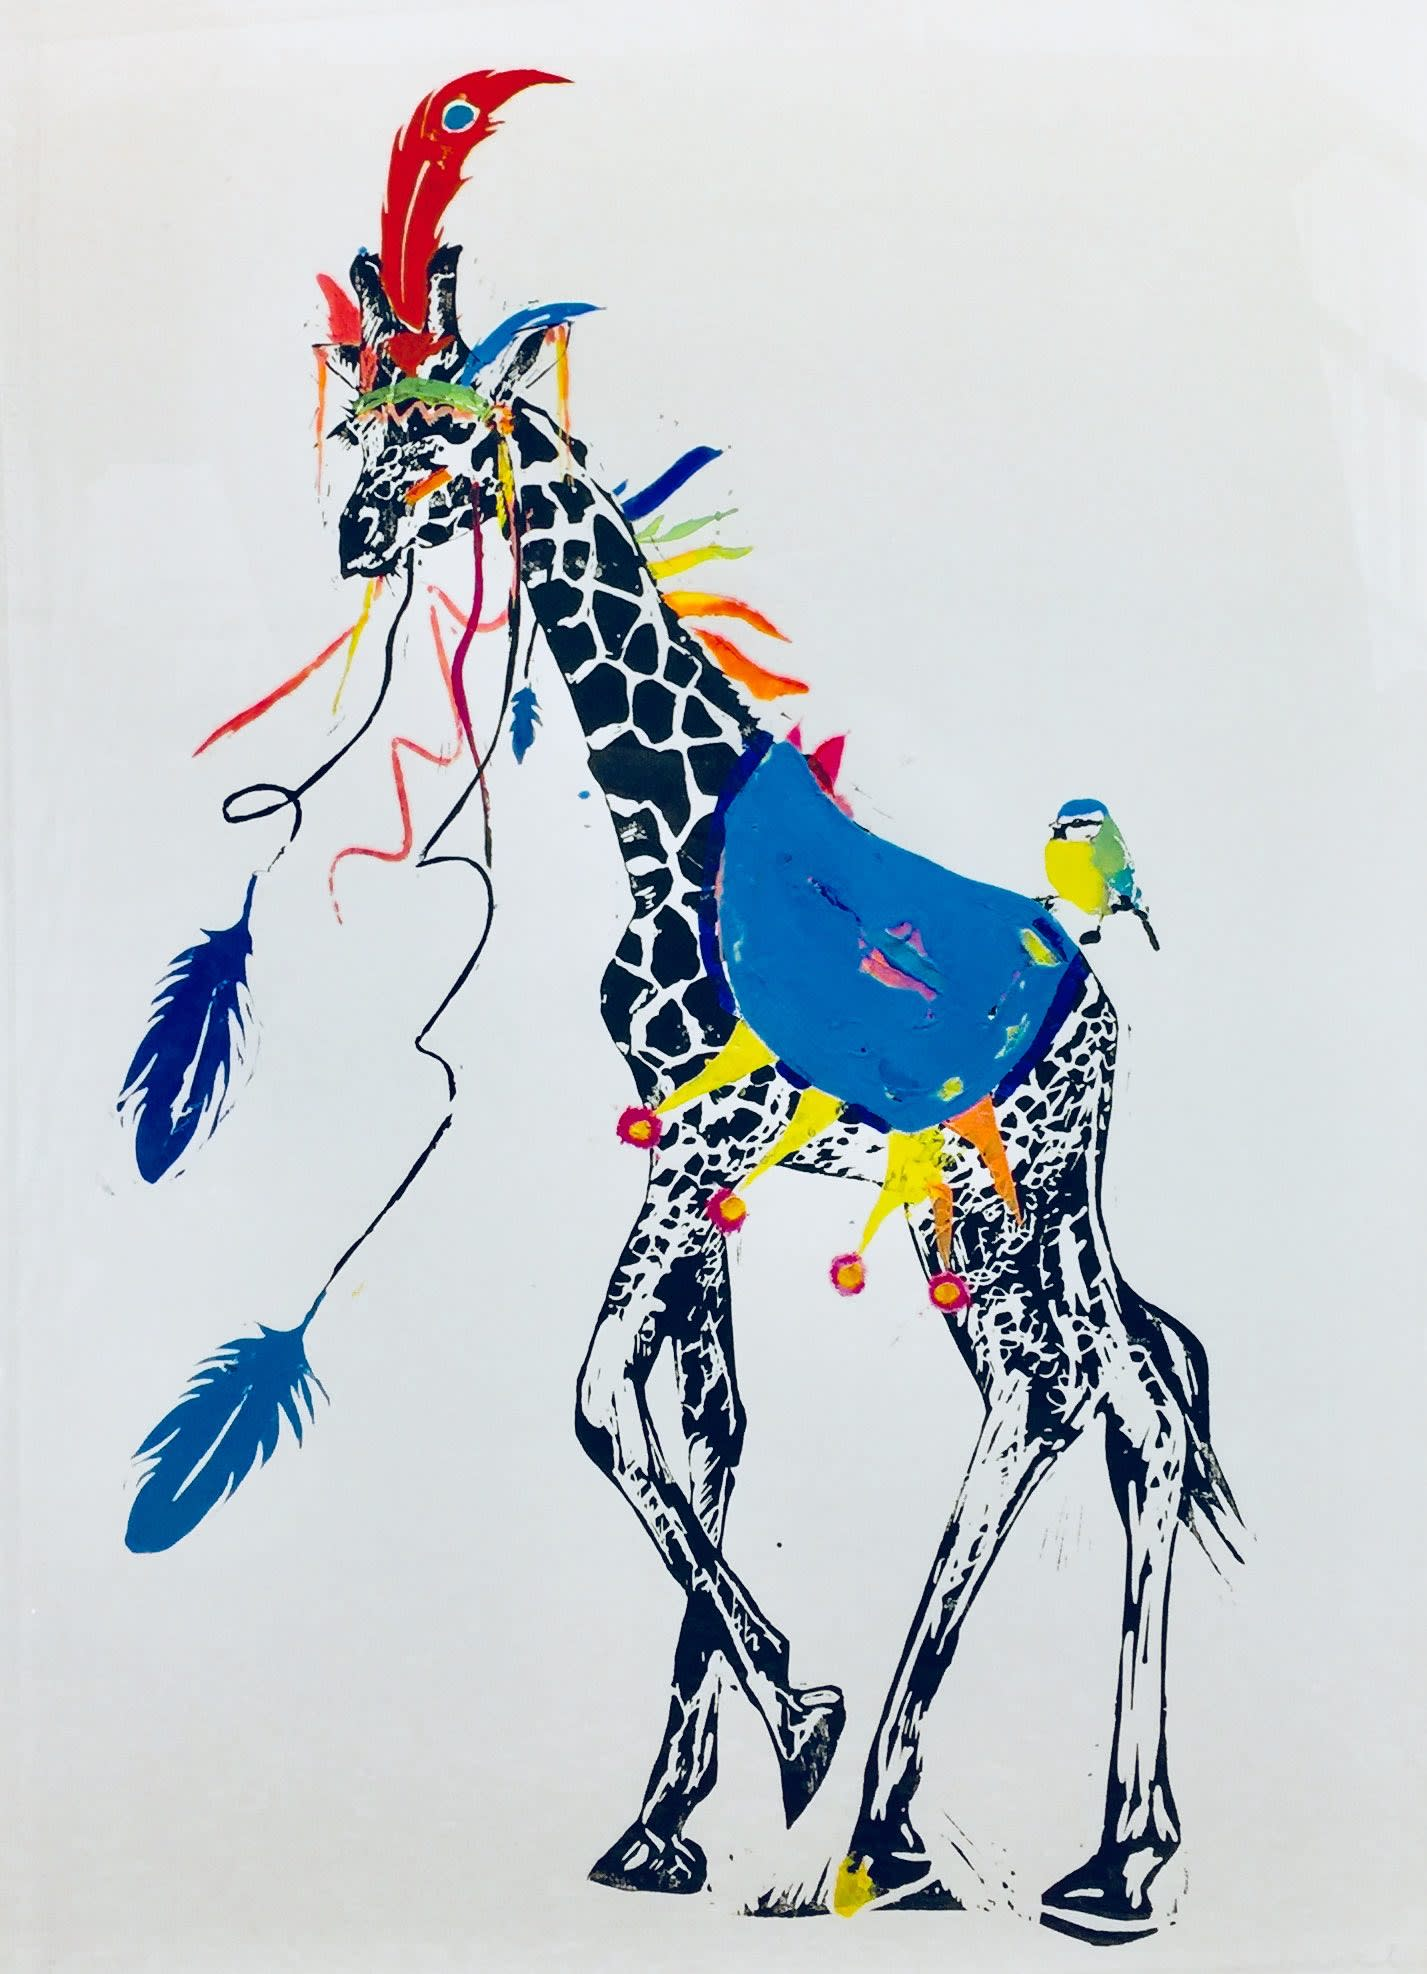 <span class=&#34;link fancybox-details-link&#34;><a href=&#34;/artists/39-millie-mccallum/works/2325-millie-mccallum-giraffe-with-blue-saddle/&#34;>View Detail Page</a></span><div class=&#34;artist&#34;><strong>Millie McCallum</strong></div> <div class=&#34;title&#34;><em>Giraffe with Blue Saddle</em></div> <div class=&#34;medium&#34;>Linocut 1/1 (framed)</div> <div class=&#34;dimensions&#34;>100 x 70 cm <br /> </div><div class=&#34;copyright_line&#34;>Copyright The Artist</div>